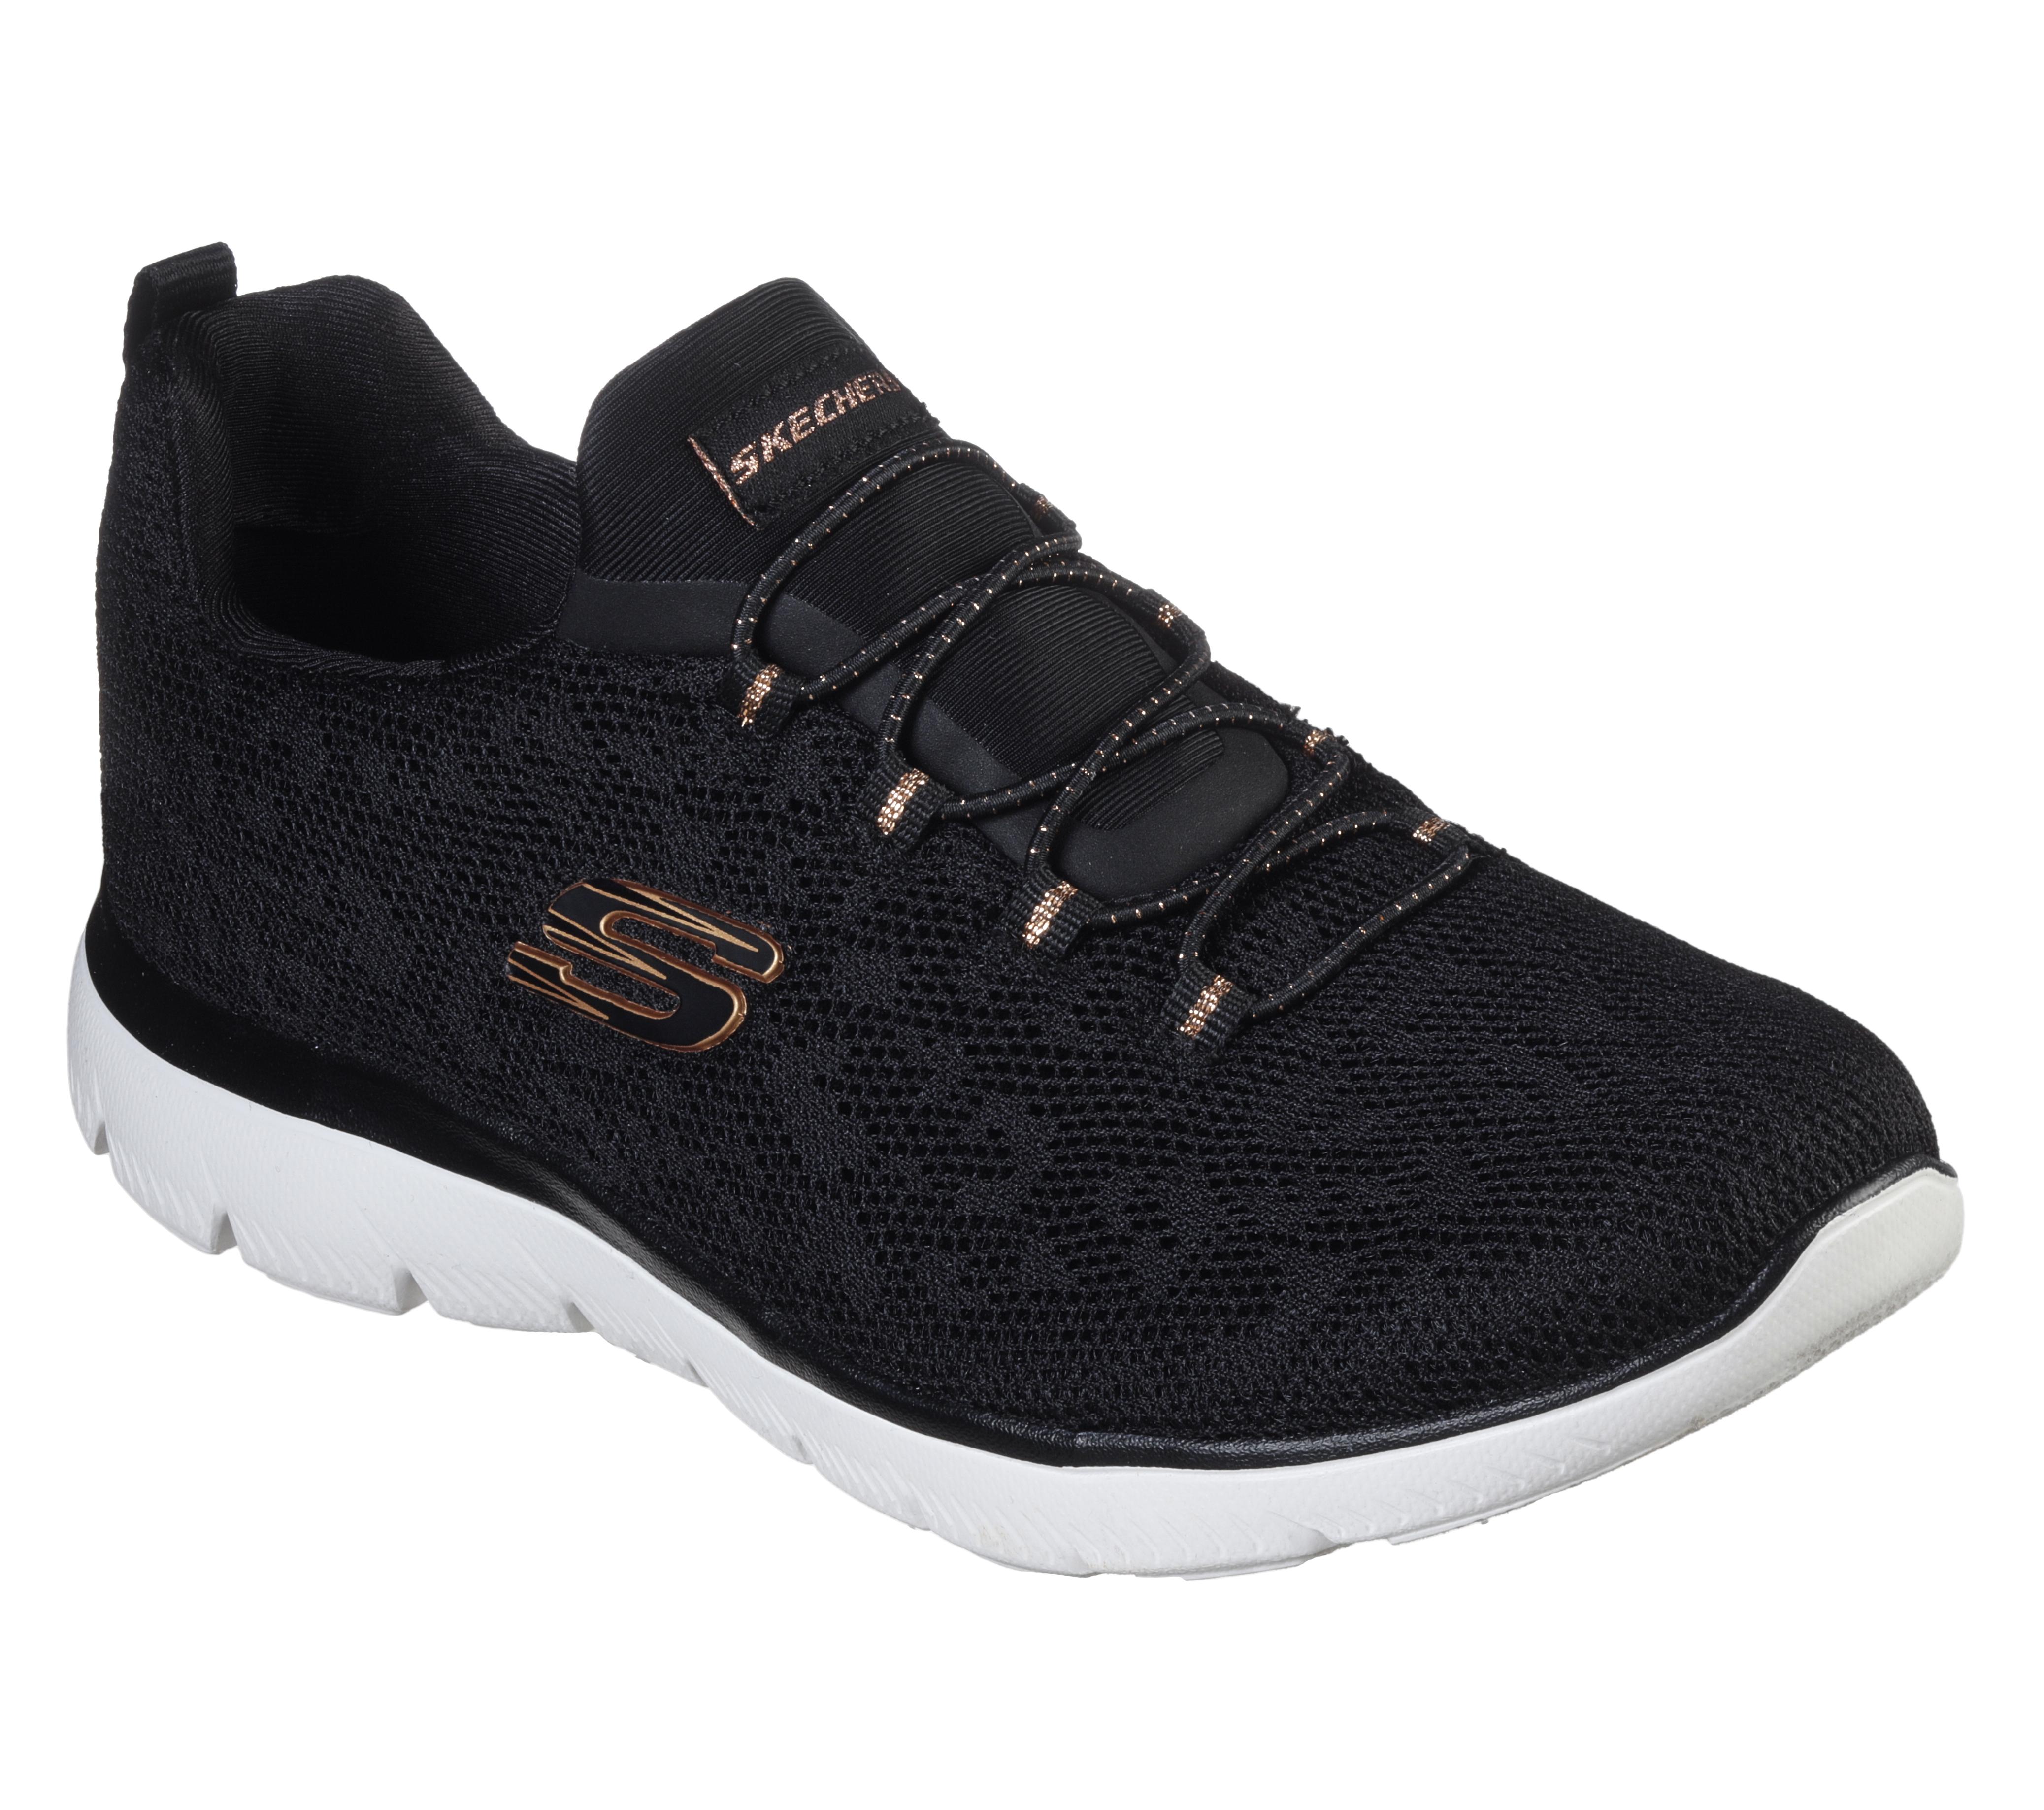 Giày thể thao Nữ Skechers SUMMITS 149037